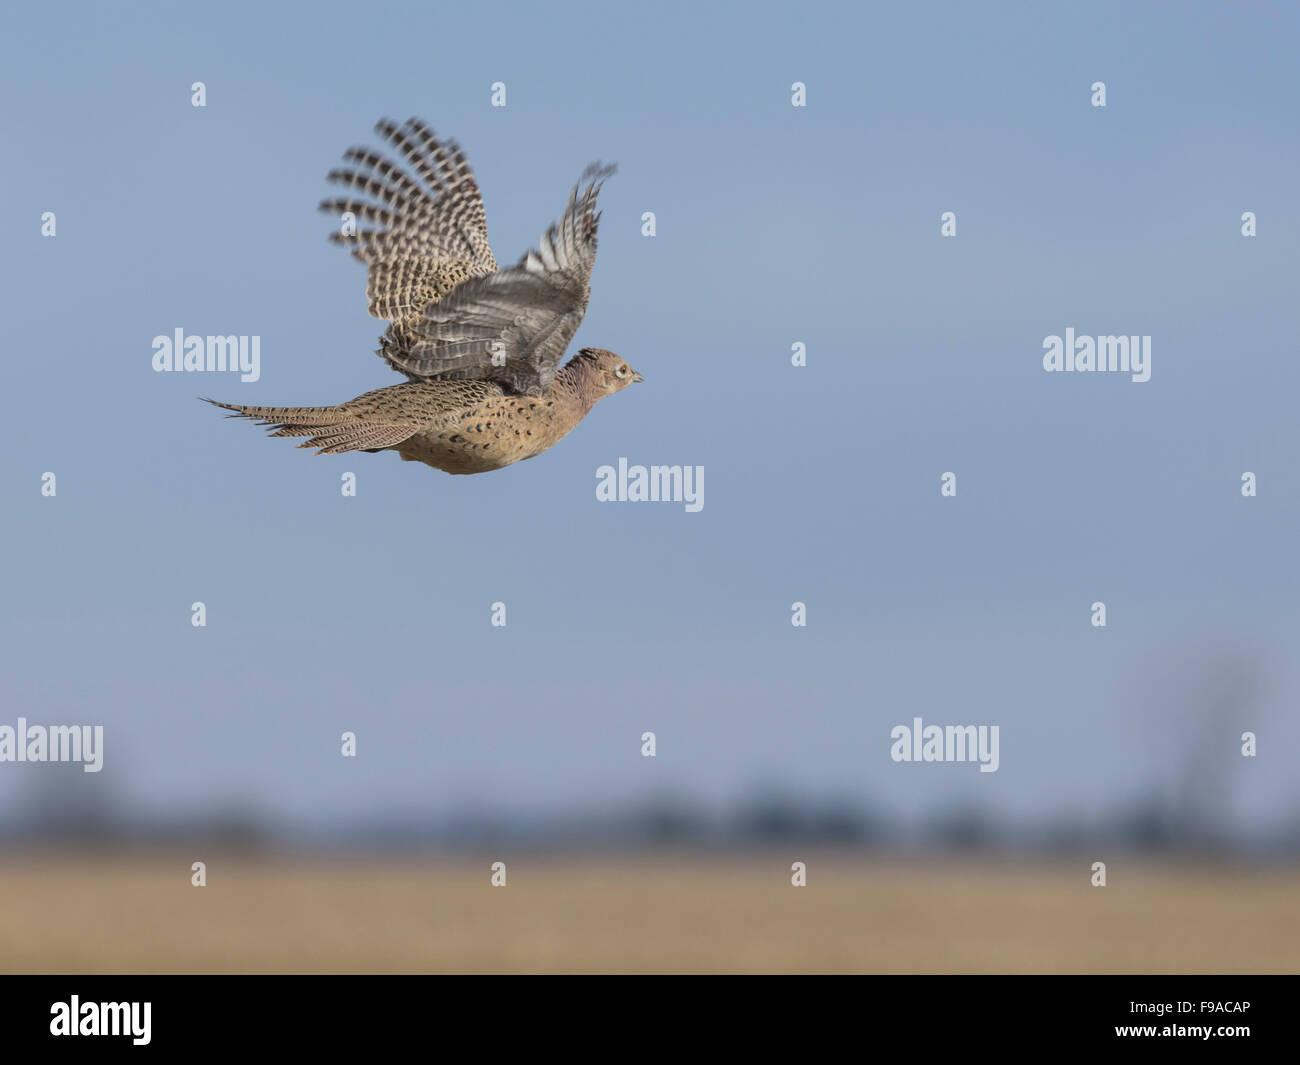 A flying hen pheasant over the North Dakota Prairie Stock Photo